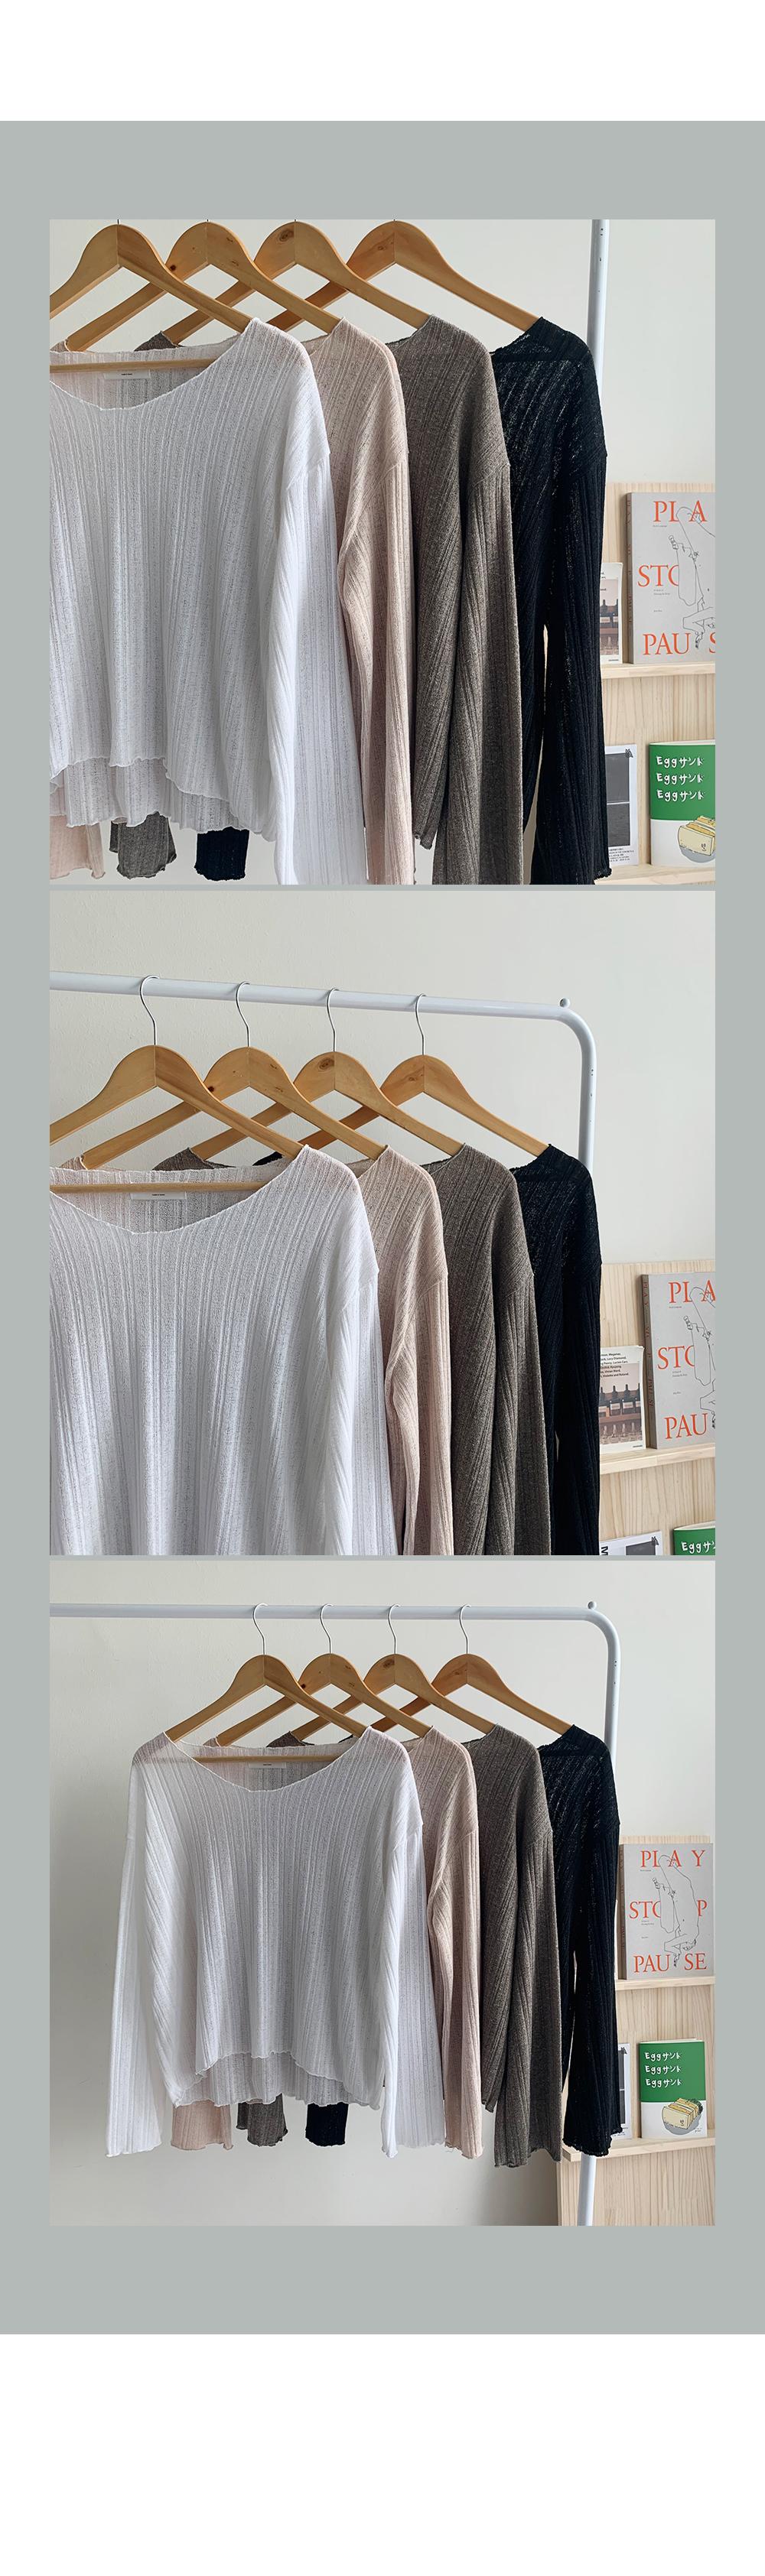 Marble Cardboard See Knit